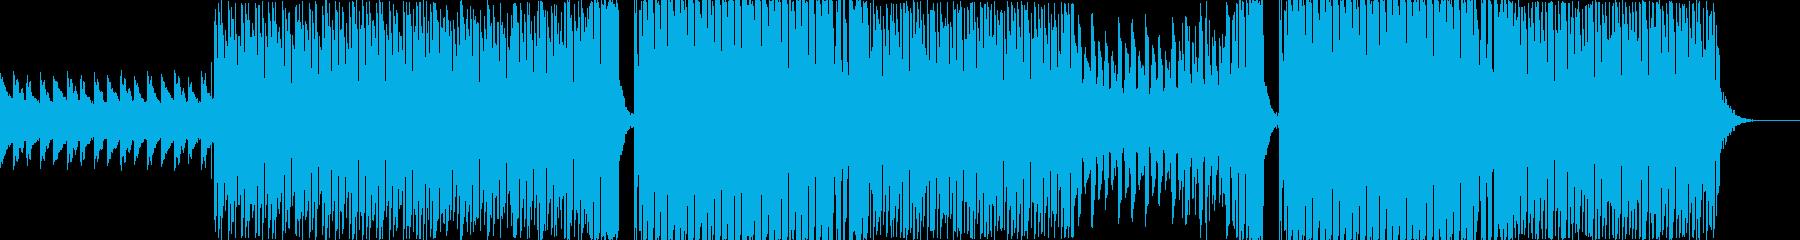 R&B要素を含んだEDMダンス曲の再生済みの波形